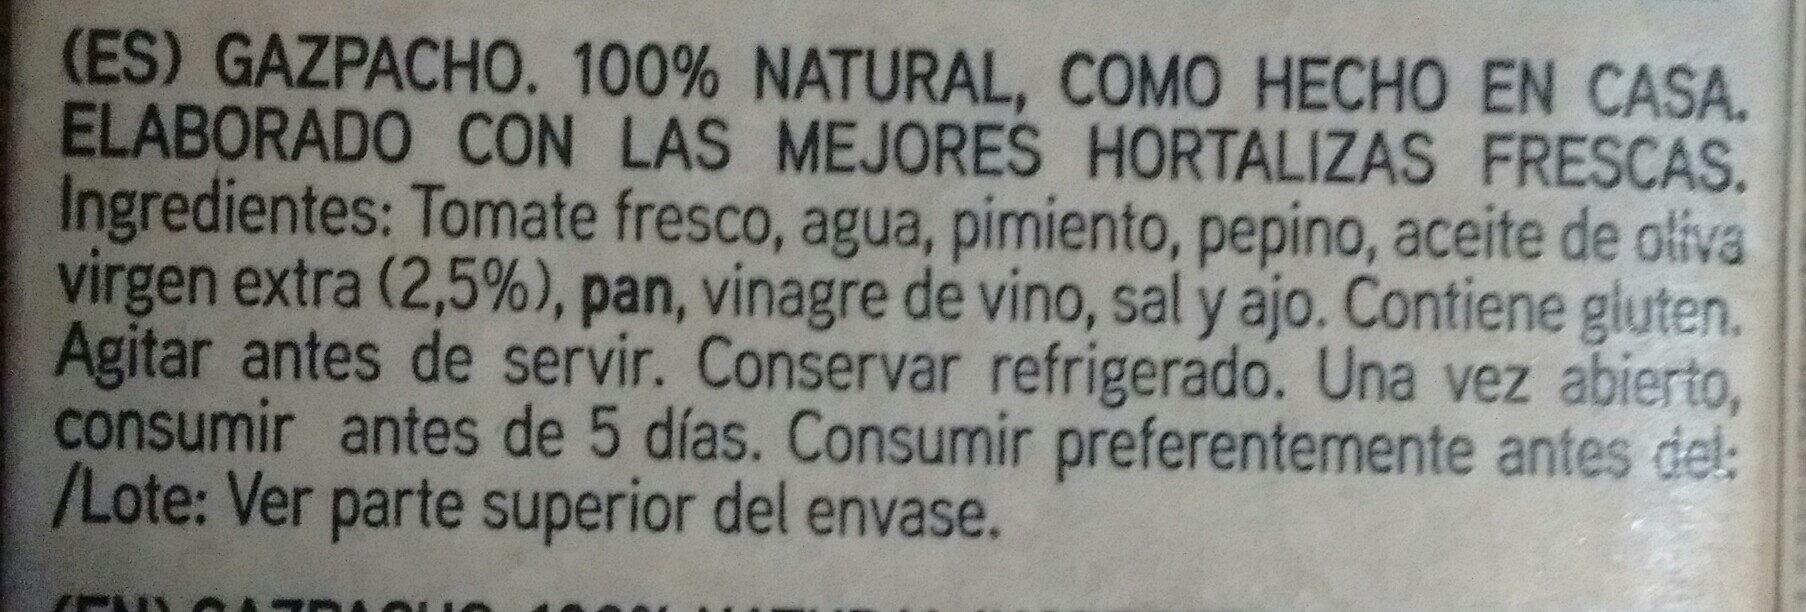 Gazpacho Suave - Ingredientes - es